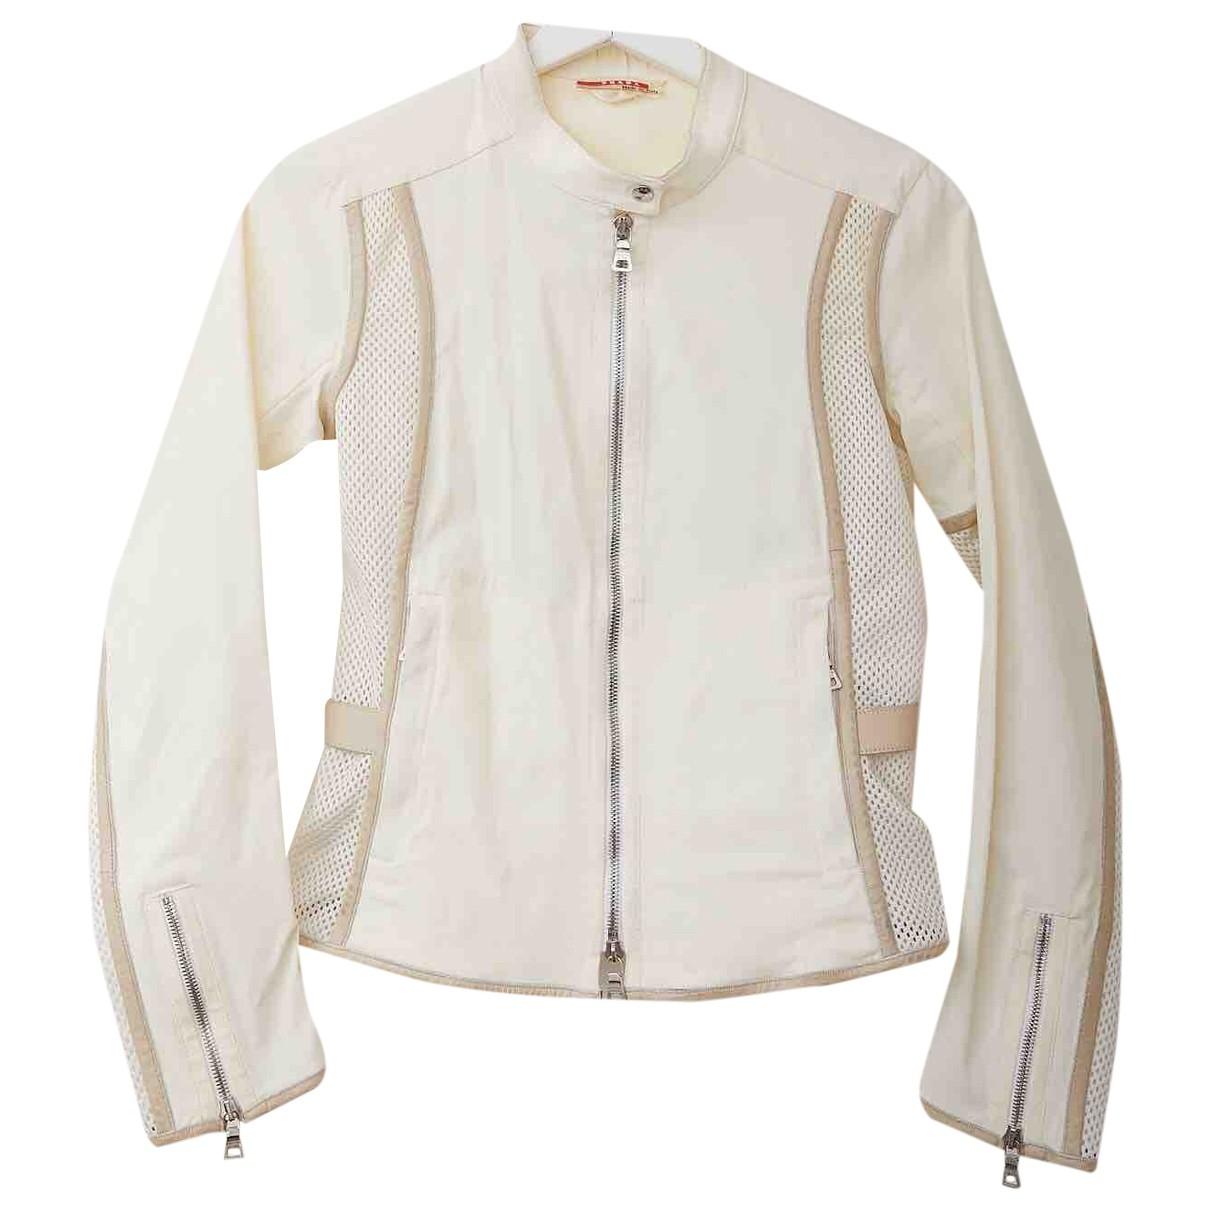 Prada \N White jacket for Women 42 IT